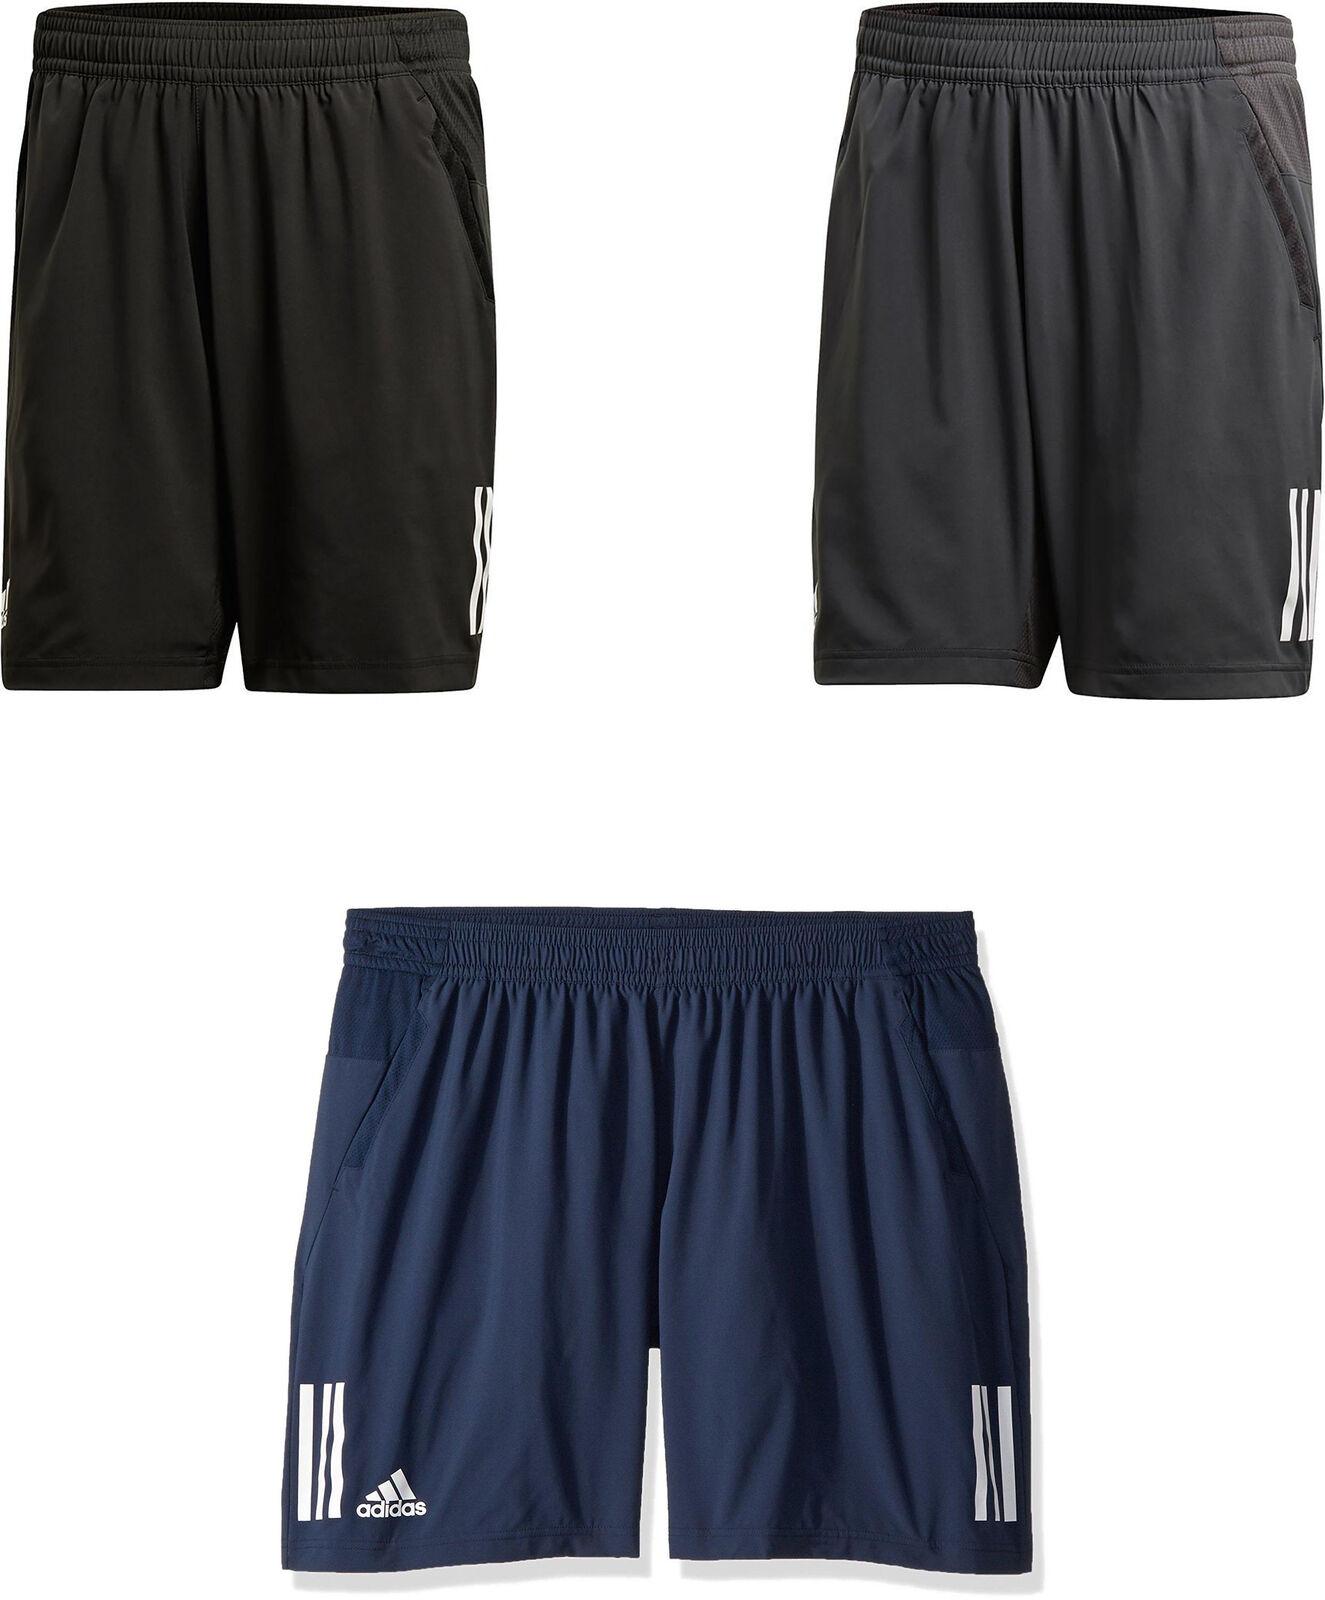 59119fbad75d adidas Men's Tennis Club 3 Stripes Shorts, 4 Colors | eBay